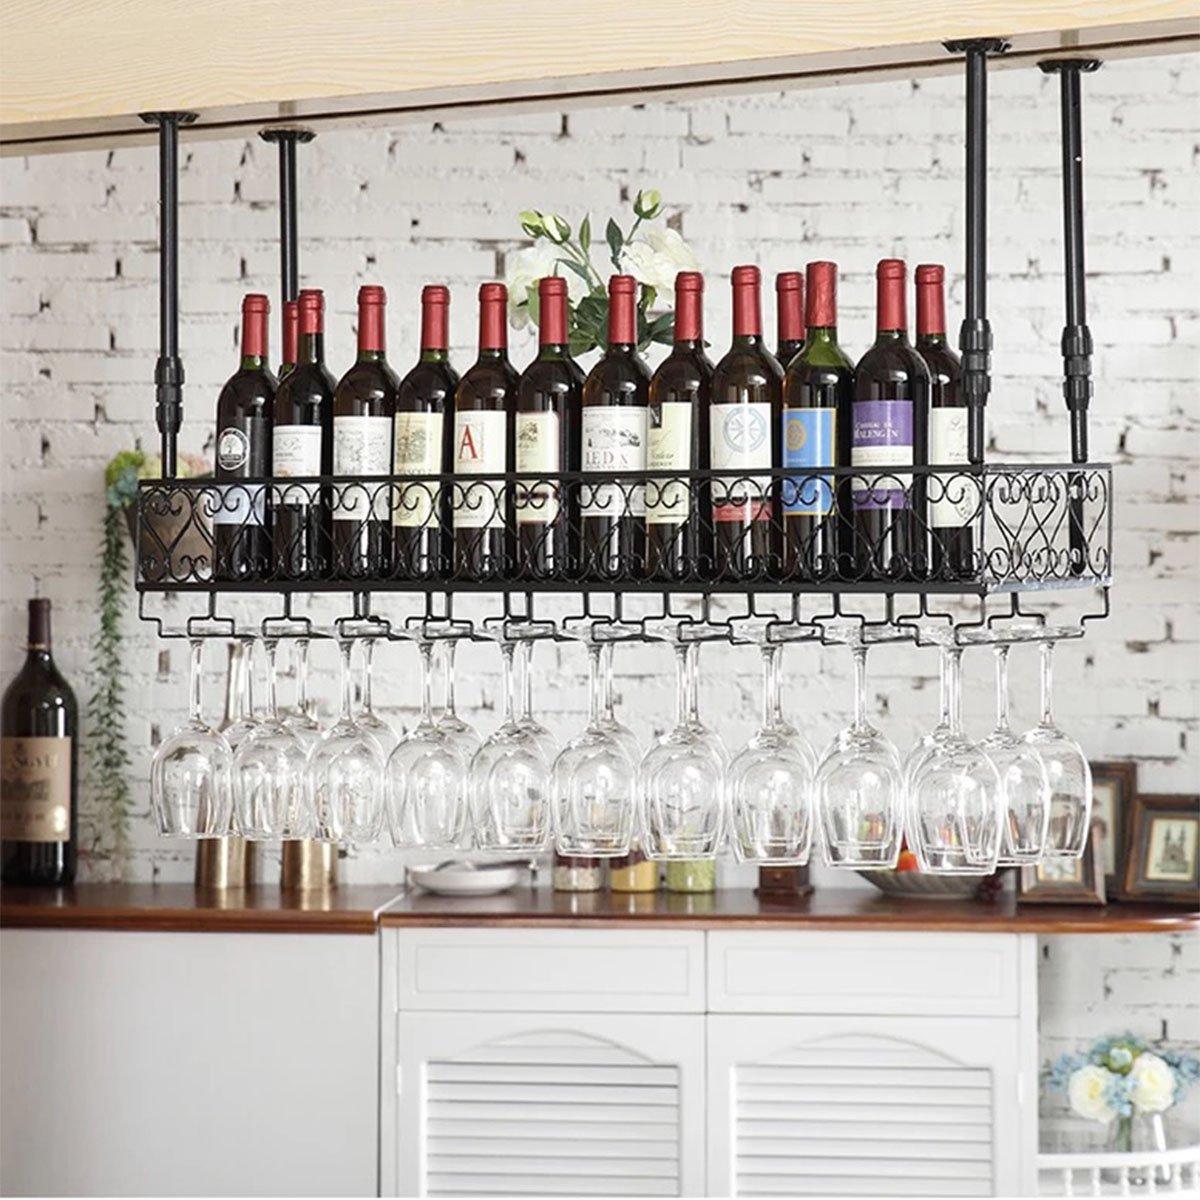 Warm Van Iron Metal Wine Glass Rack Stemware Racks Upside Down Cup Holder Hanging Cup Holder Shelf Shelves 47.2''L (black)